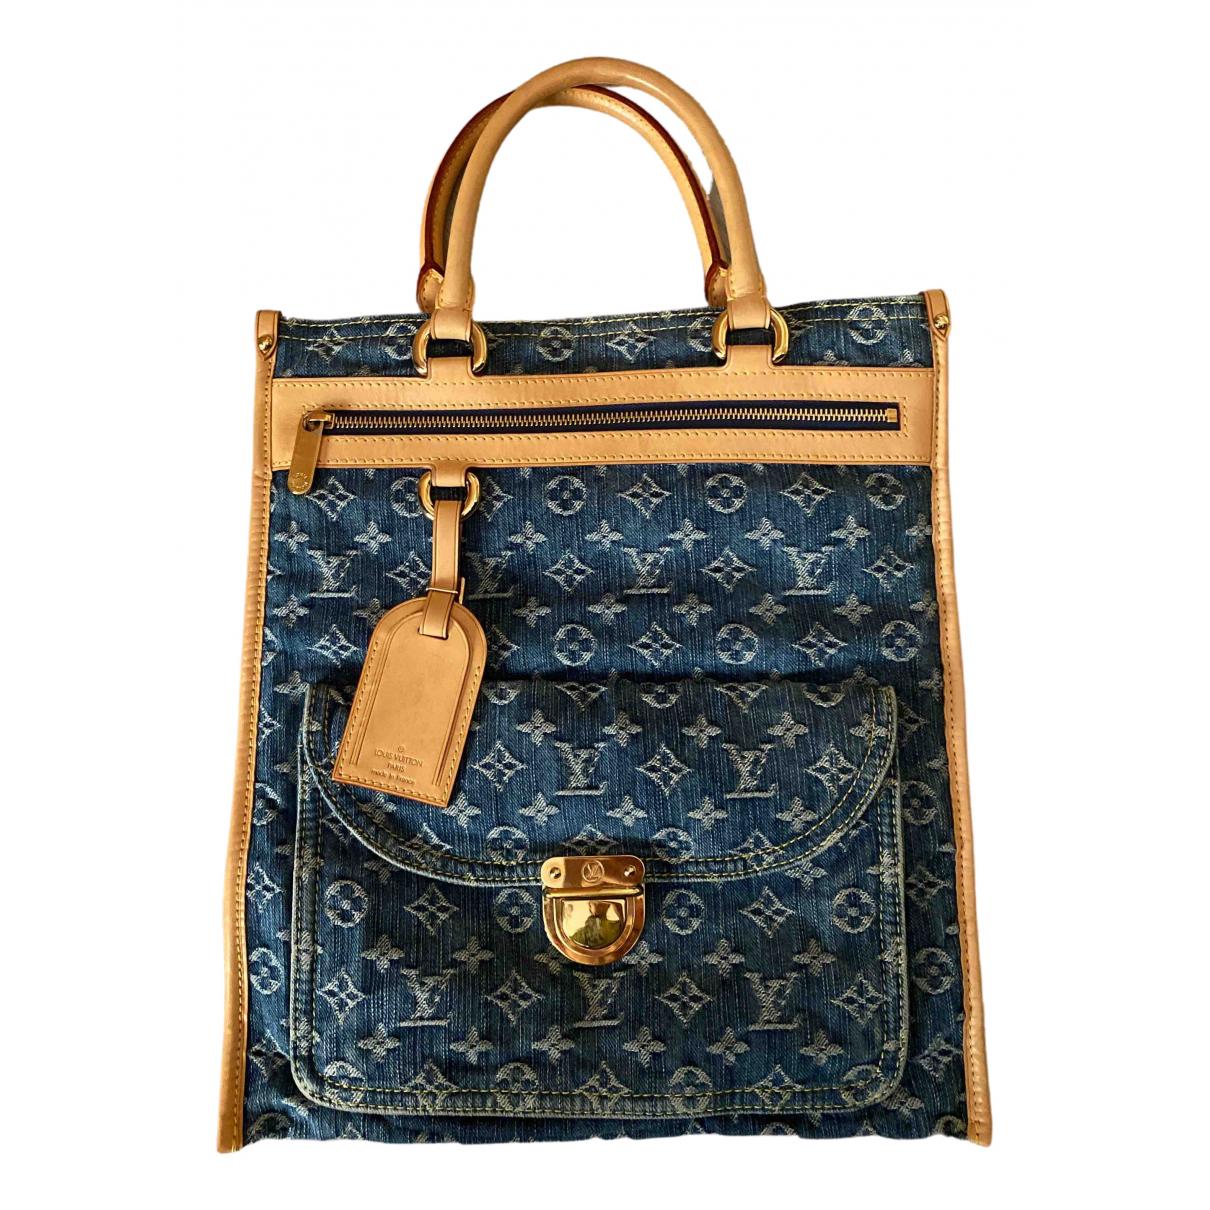 Louis Vuitton N Navy Denim - Jeans handbag for Women N